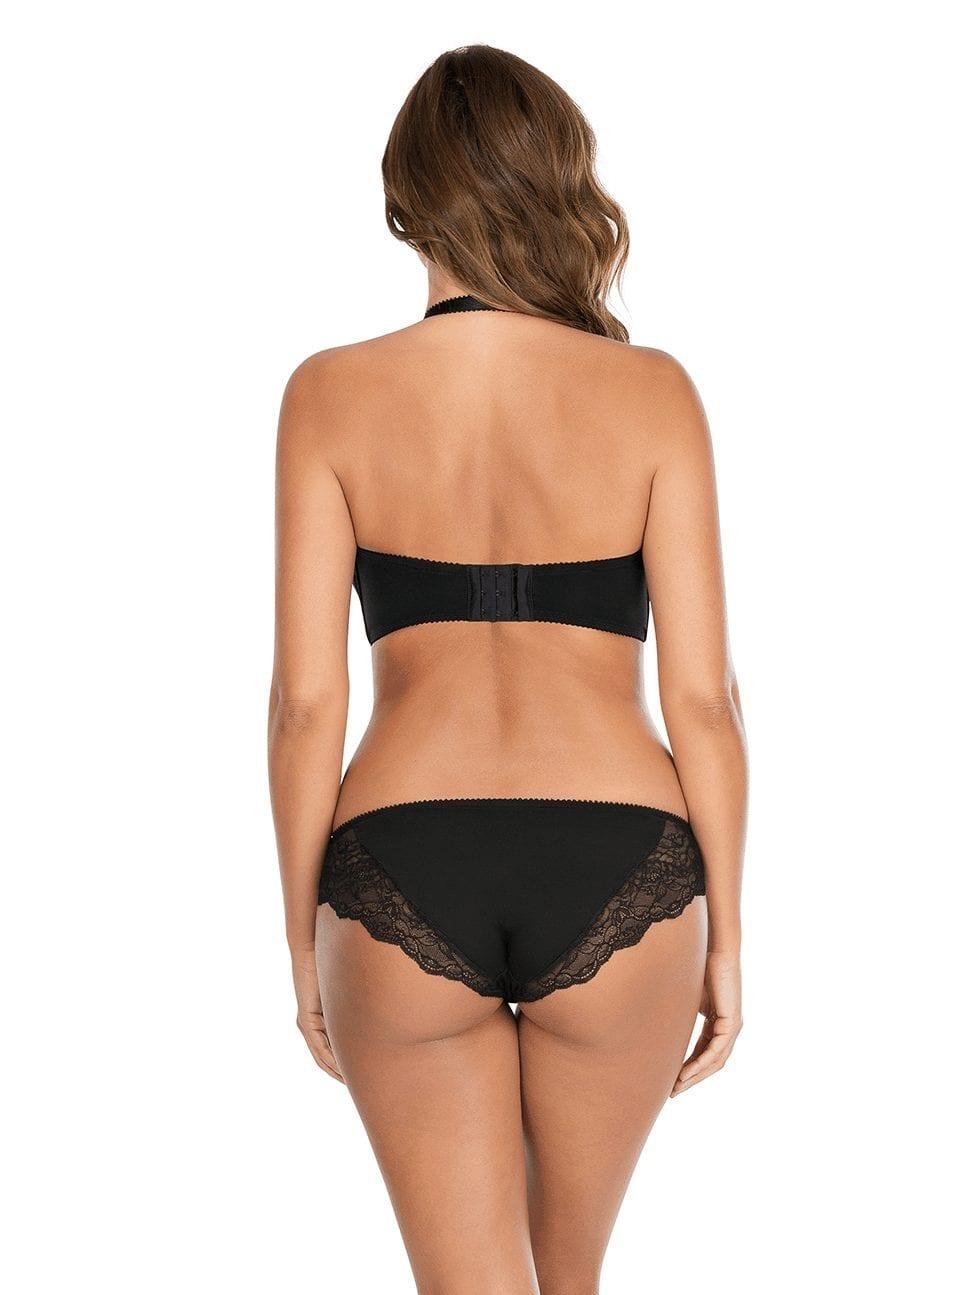 Бюстгальтеры Elissa_ContourUnderwireBraP5011_BikiniP5013_Black_Halter-Back